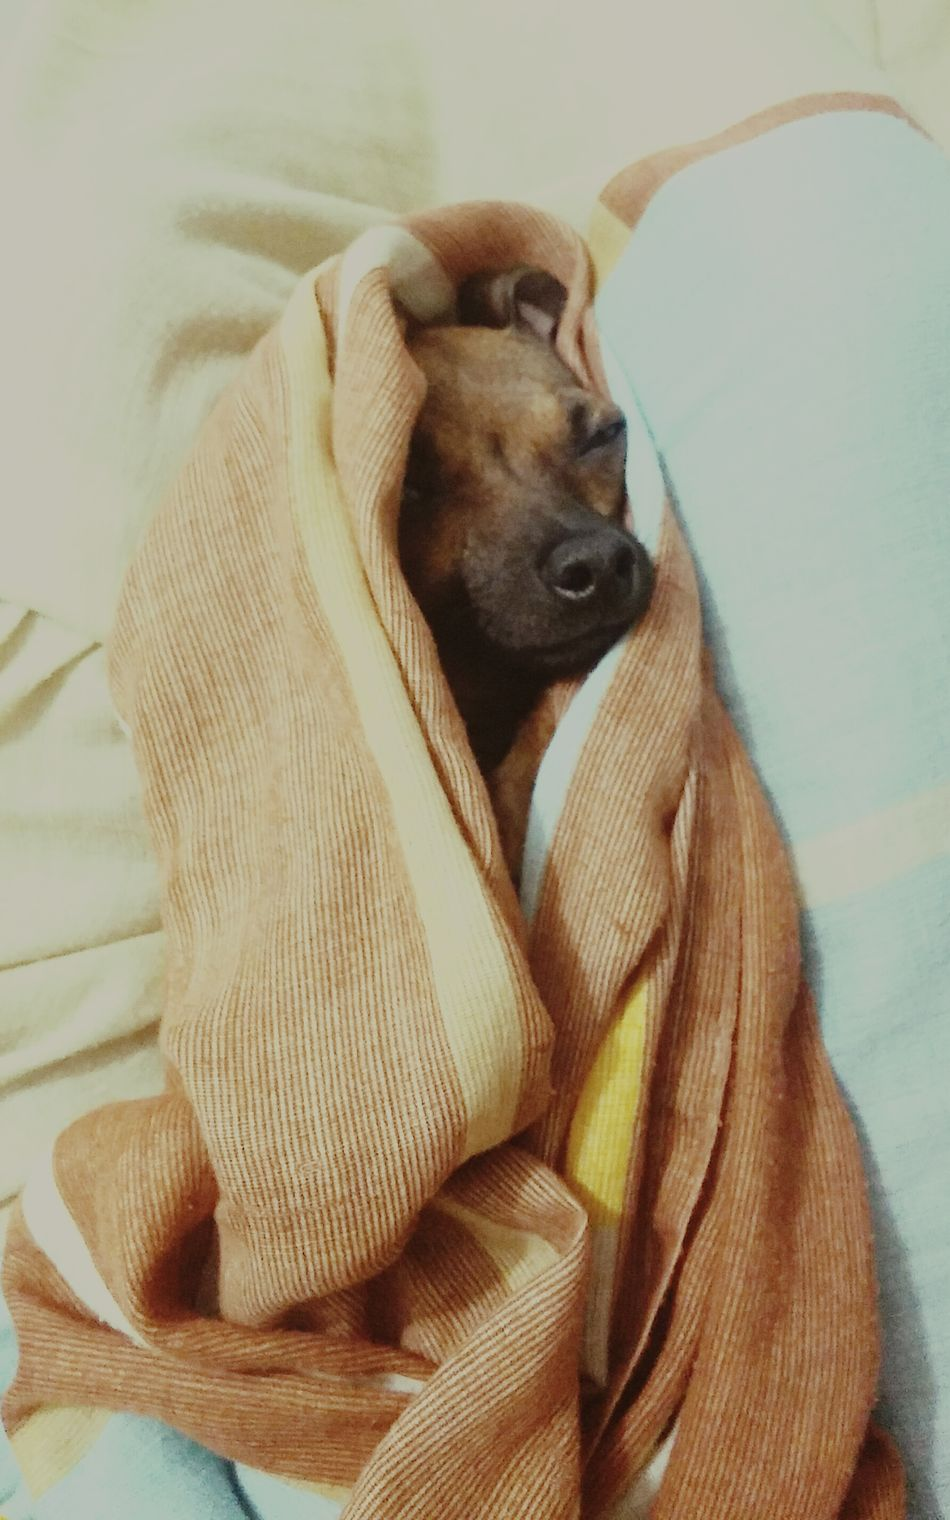 She is Inward, my Love, my Dog. Say Cheese!